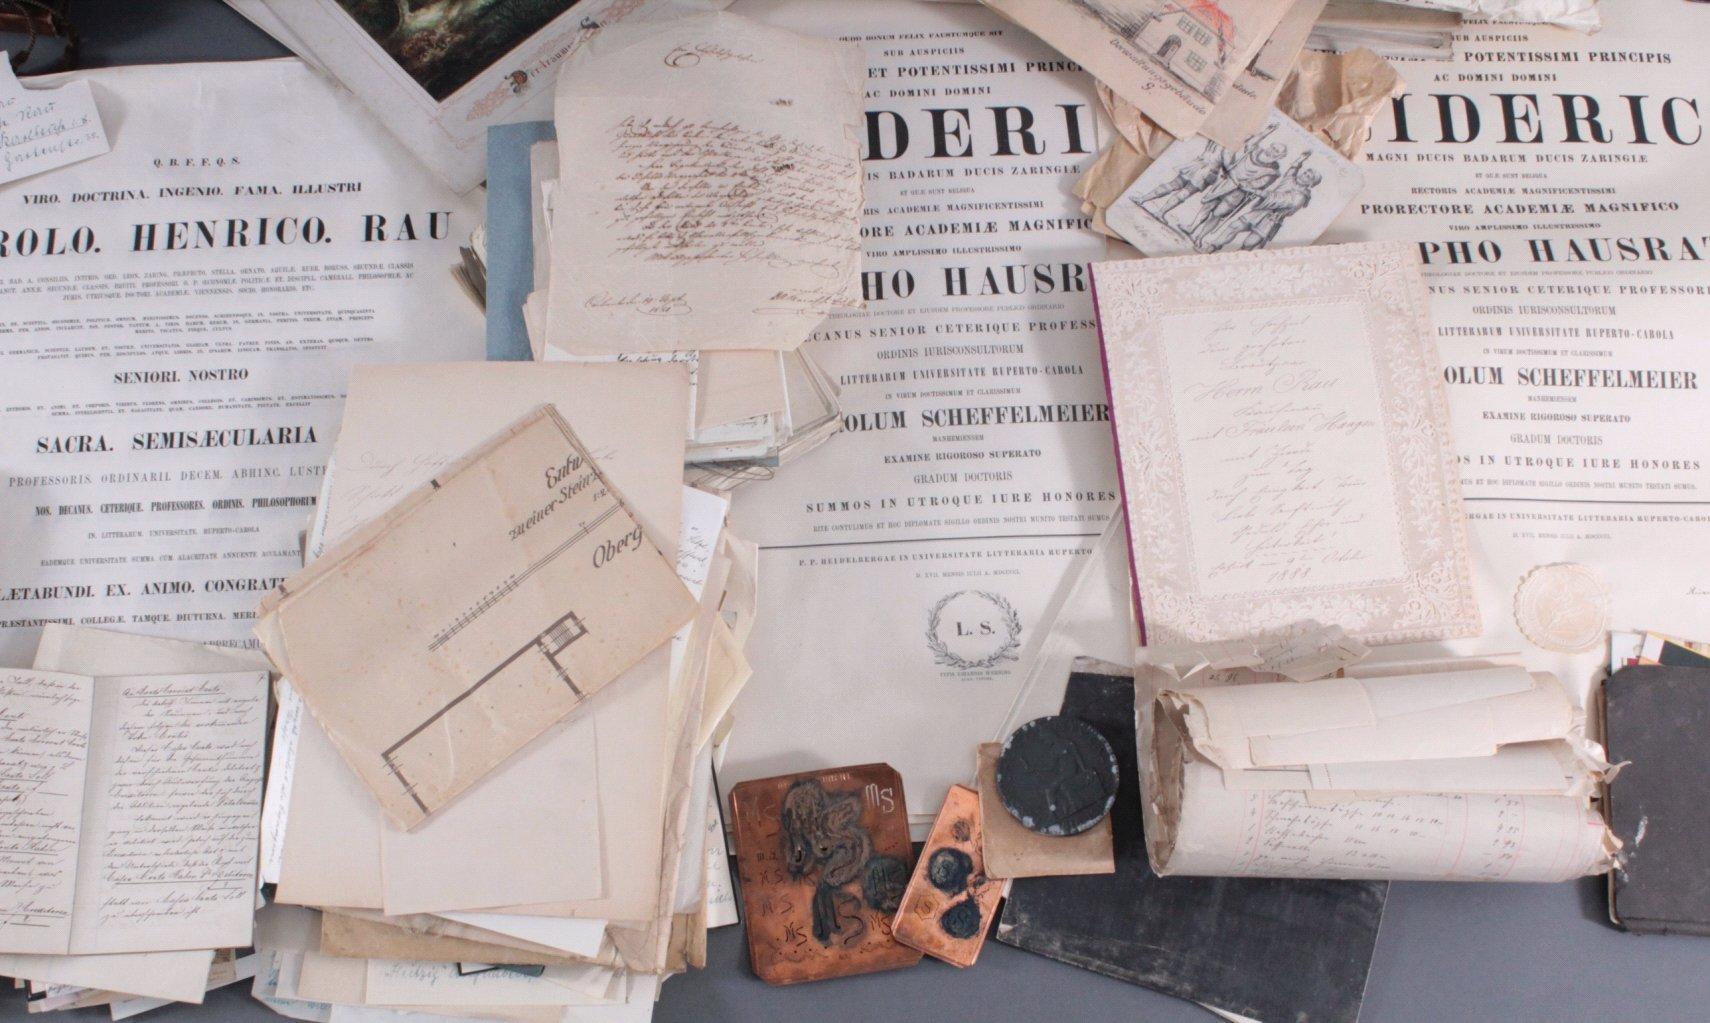 Großer  Papier und Dokumentennachlass , Karton prall gefüllt-5